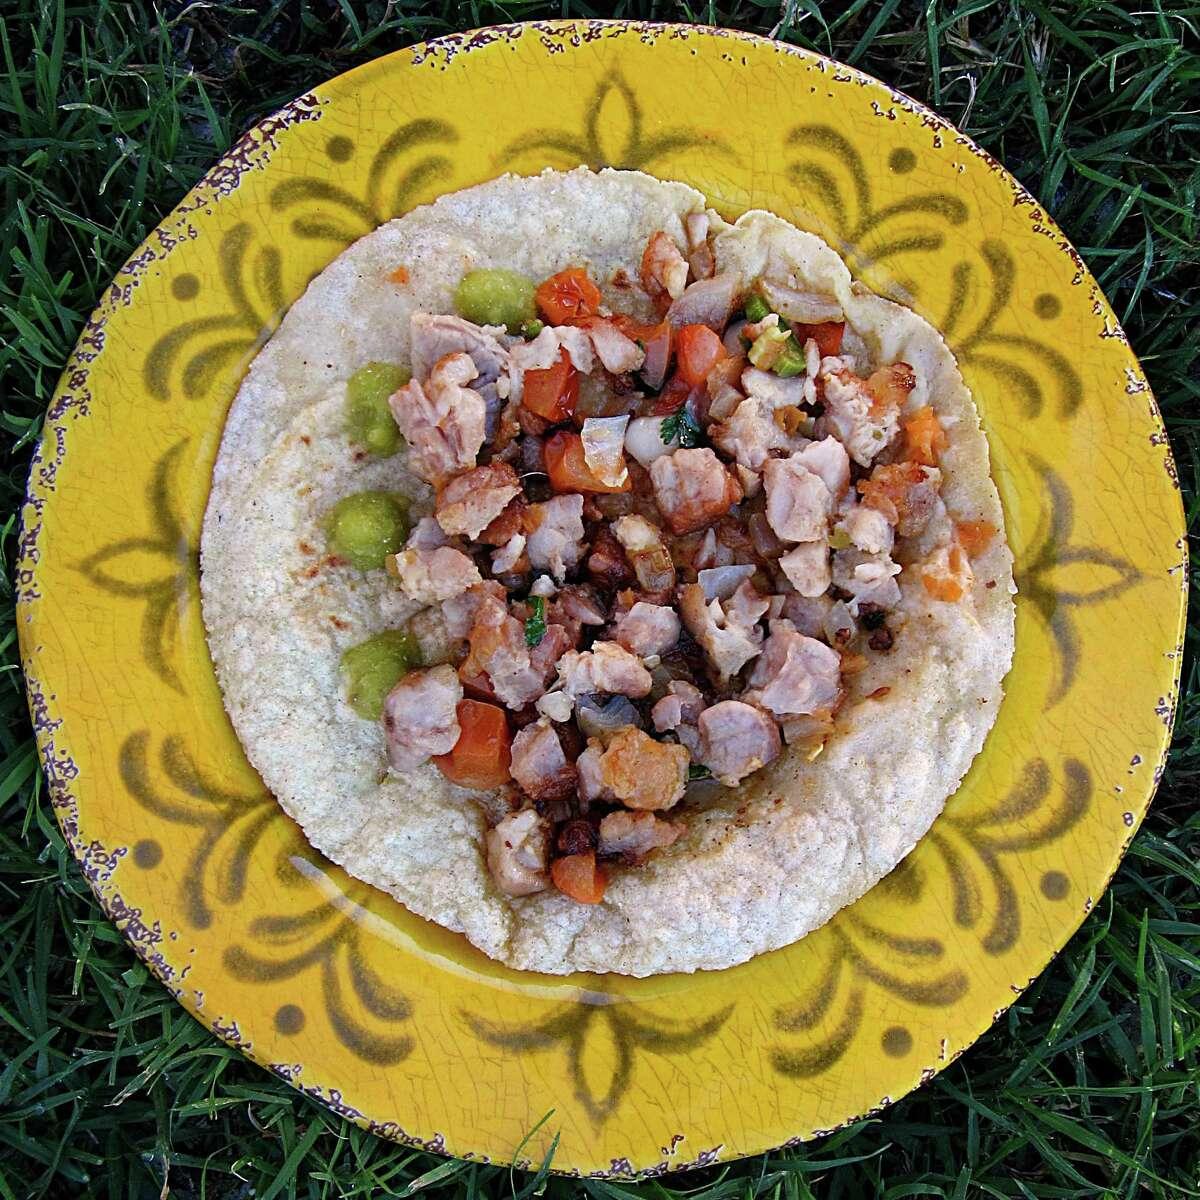 Mollejas (sweetbreads) taco on a handmade corn tortilla from Mittman Fine Foods.